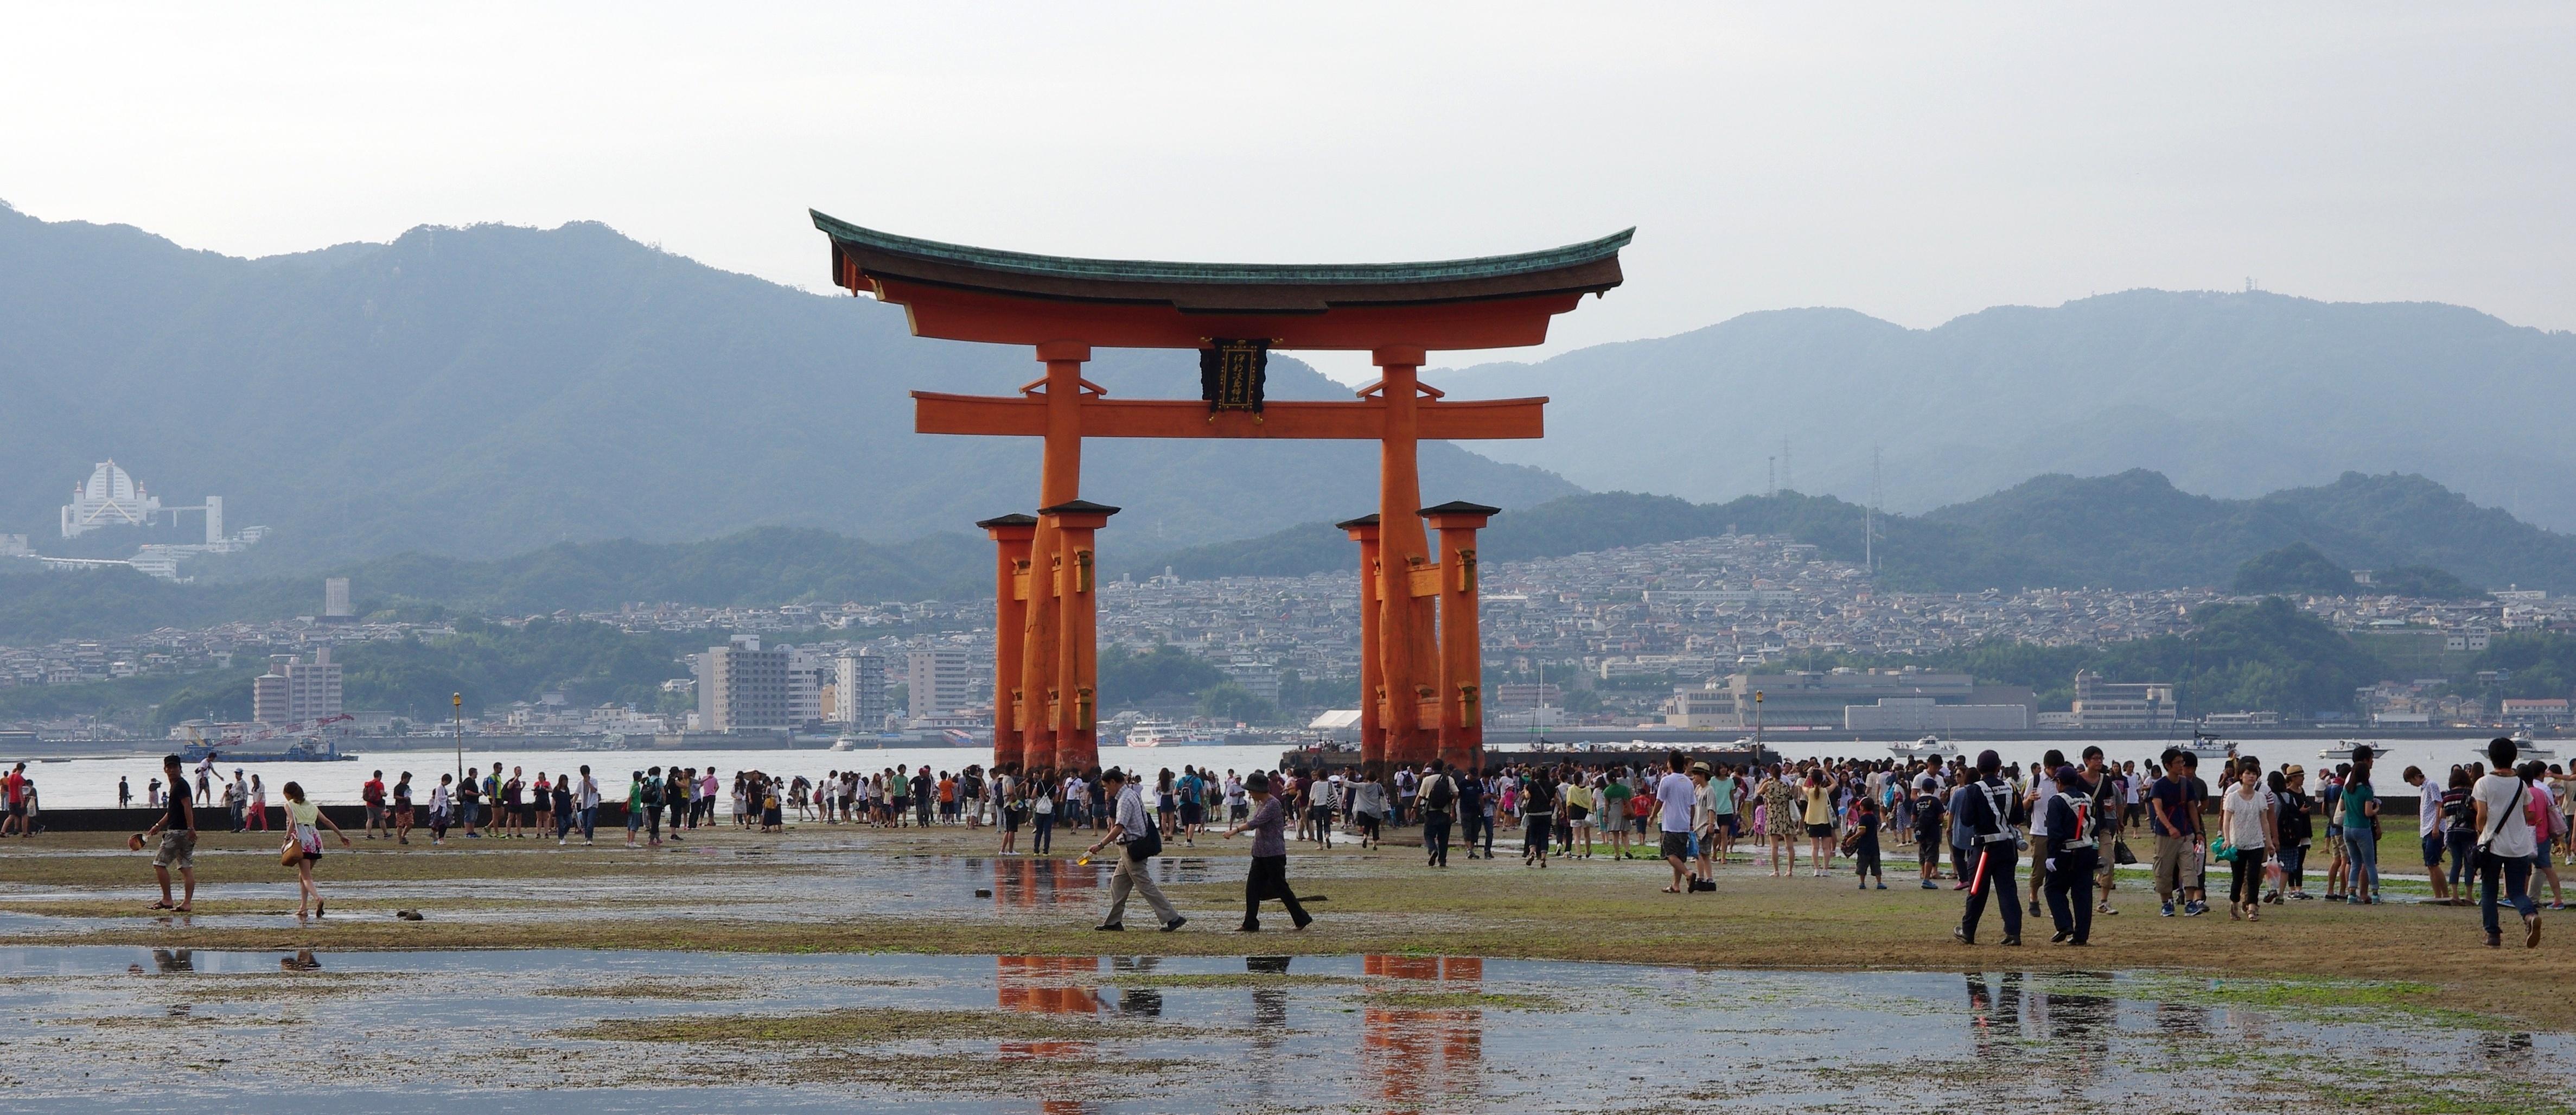 日本 自助